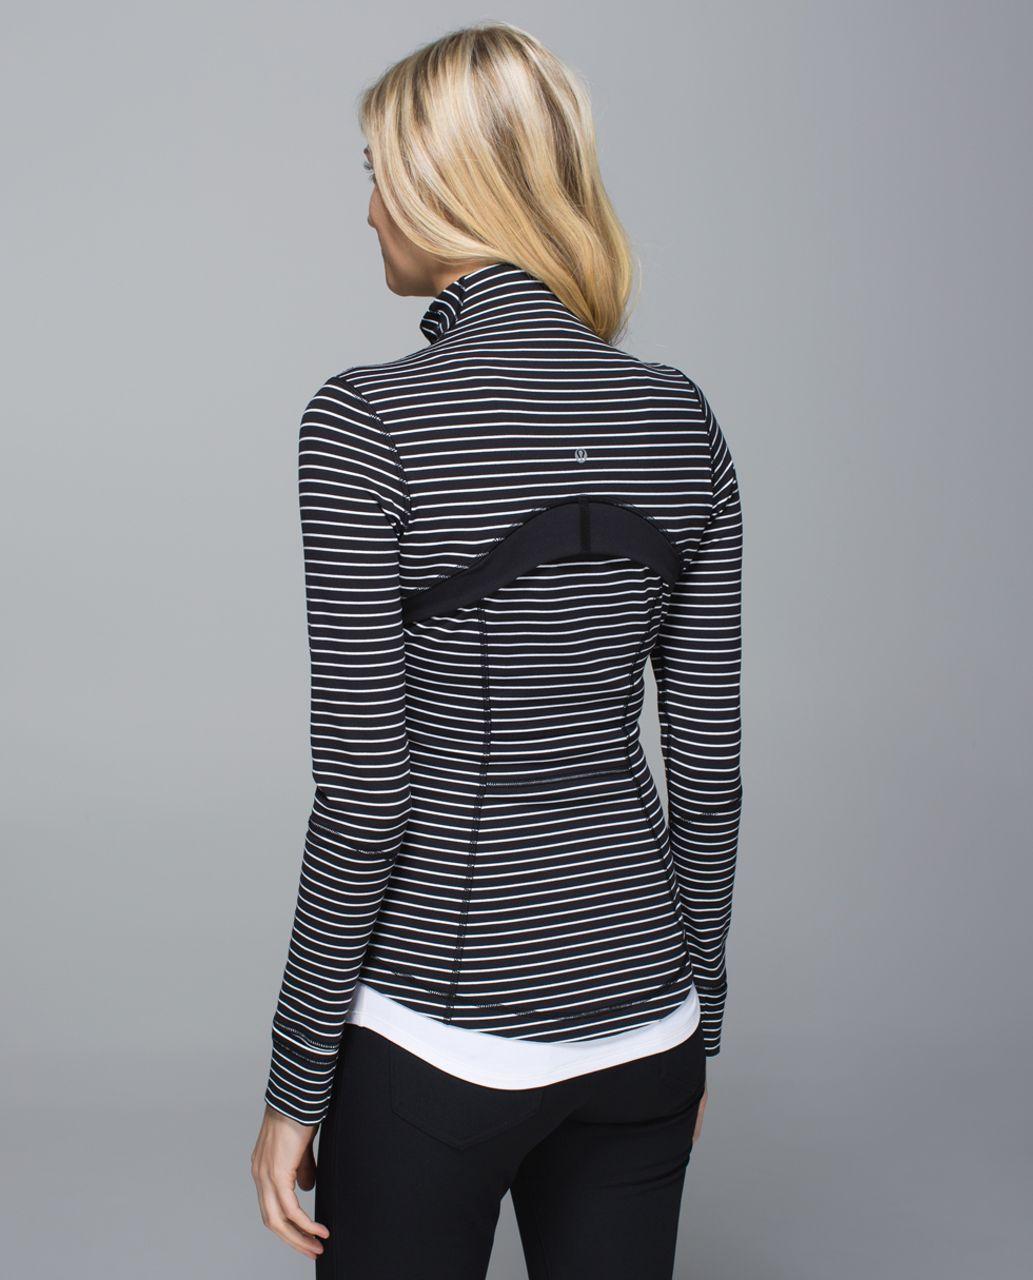 Lululemon Define Jacket - Parallel Stripe Black White / Black